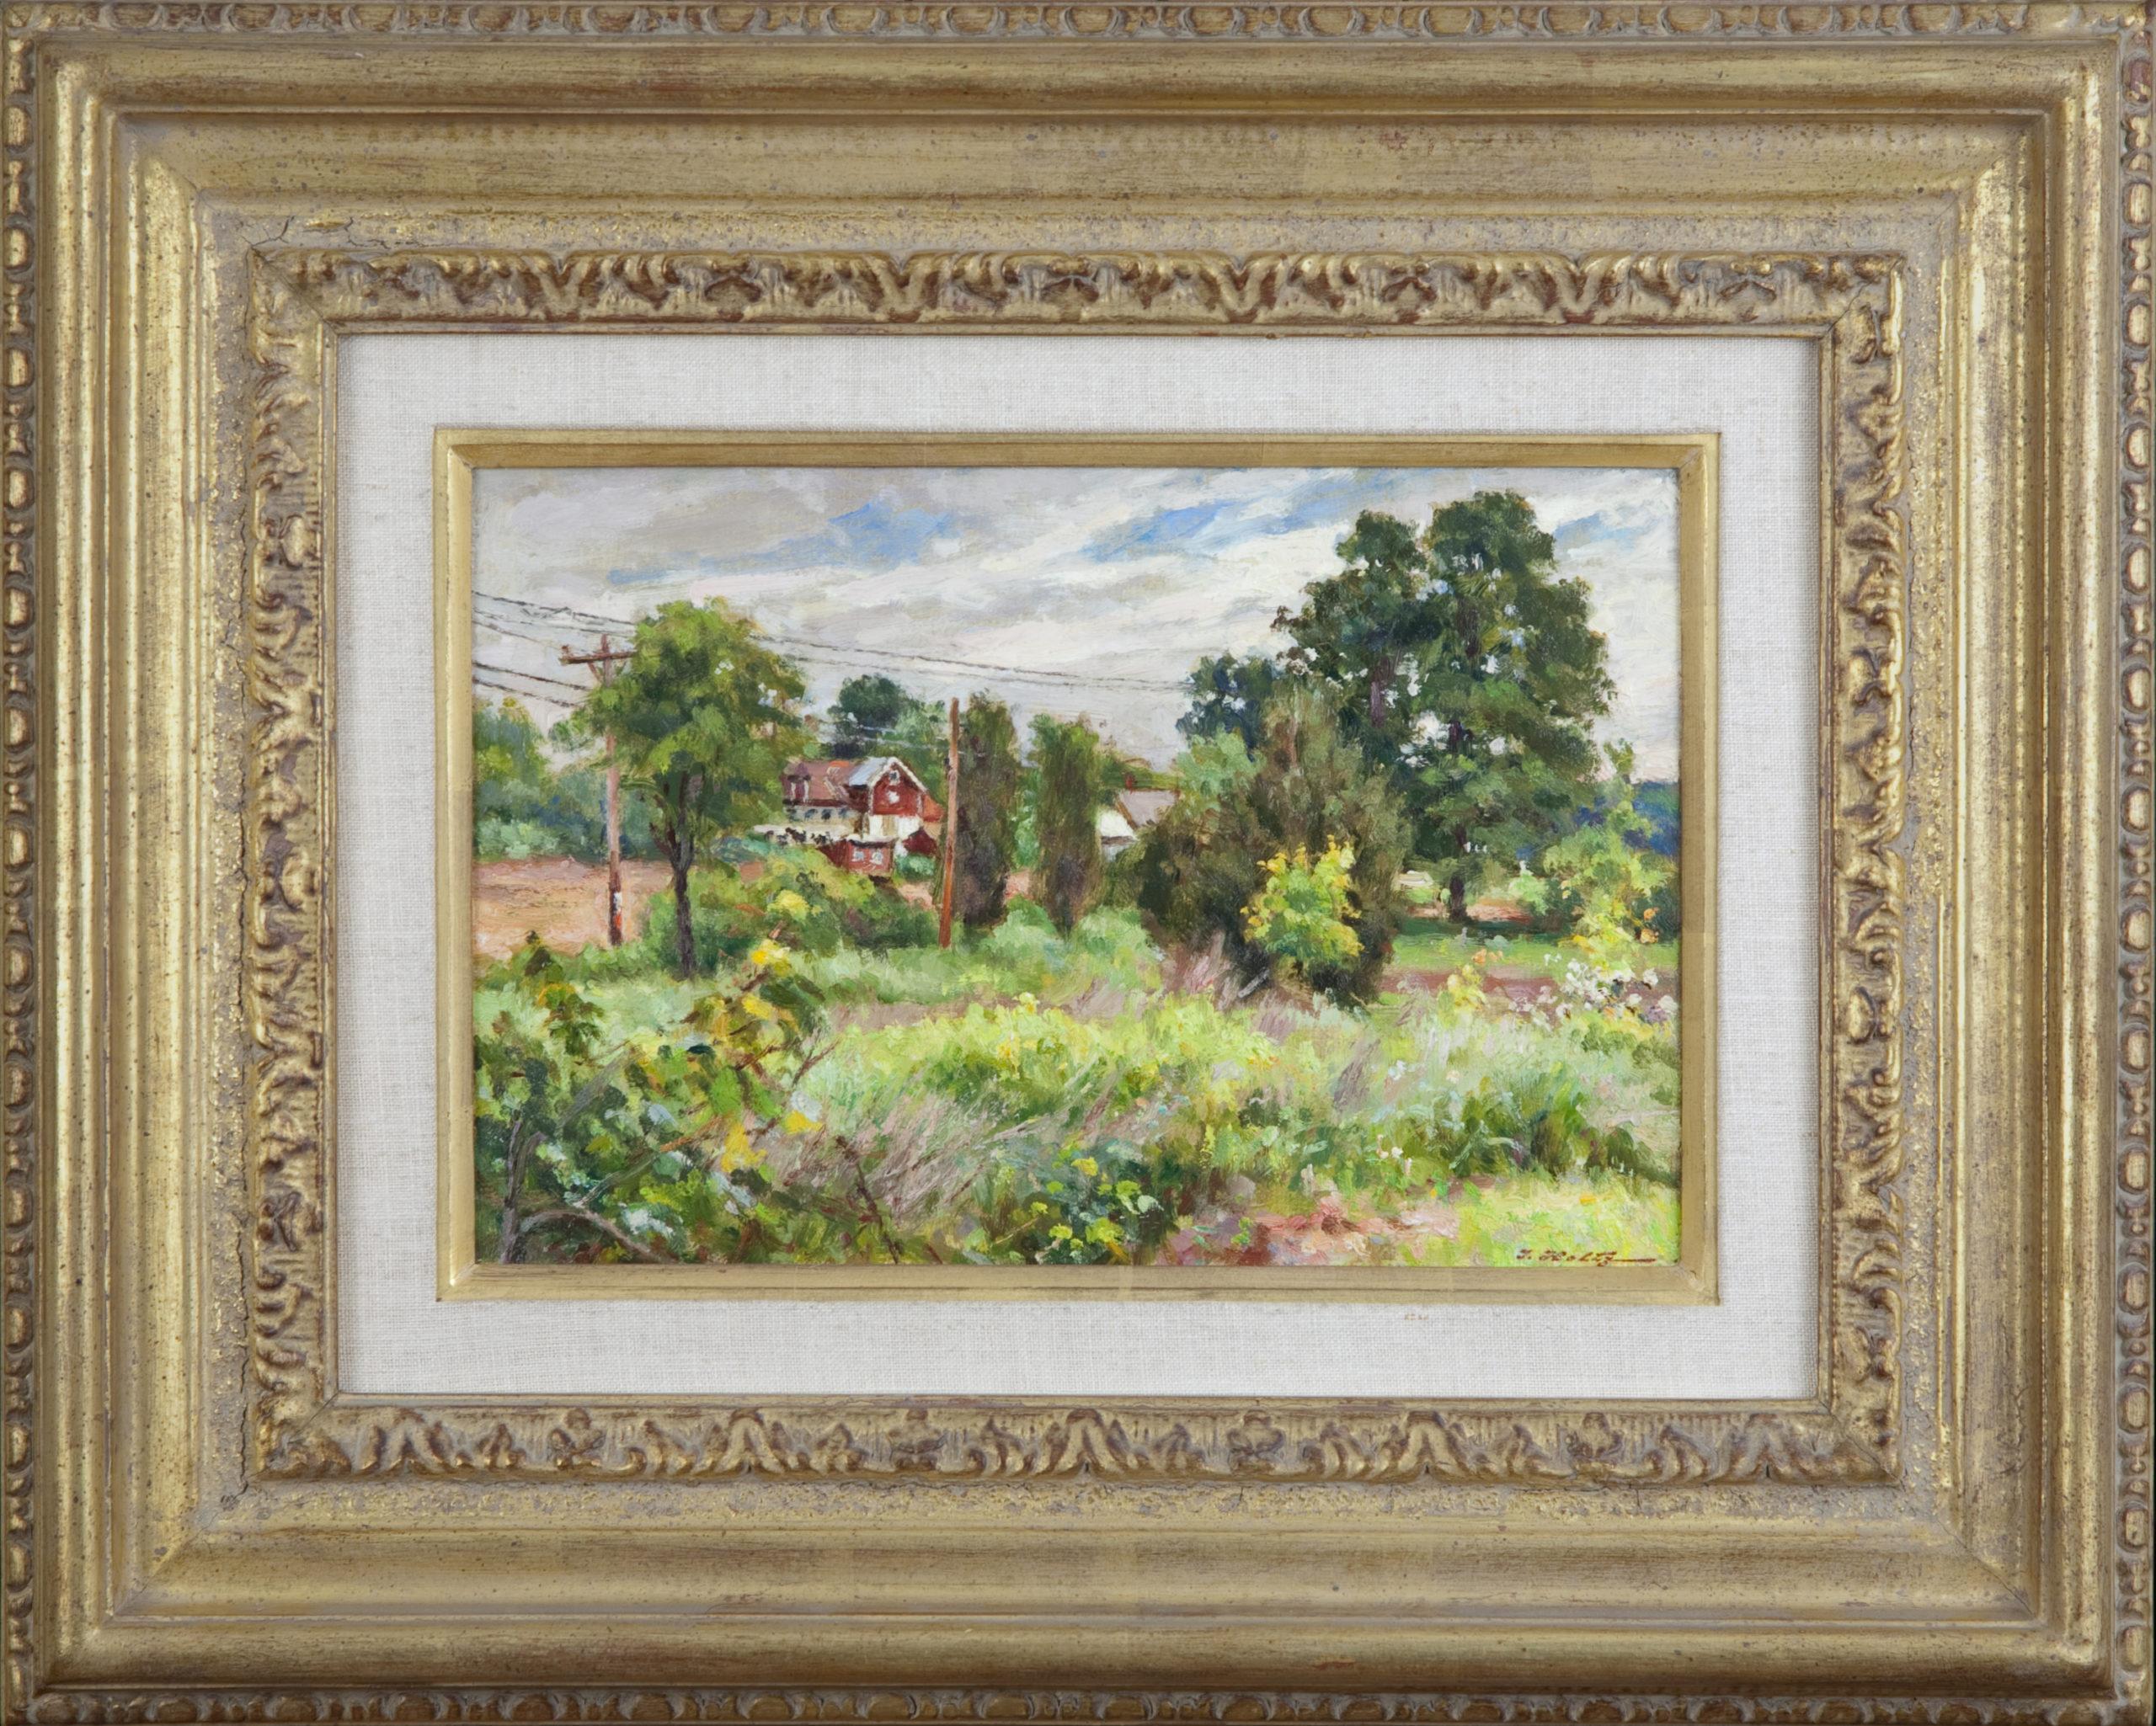 041 Summer End 1982 - Oil on Canvas - 12 x 8 - Frame: 16.75 x 20.75 x 2.25